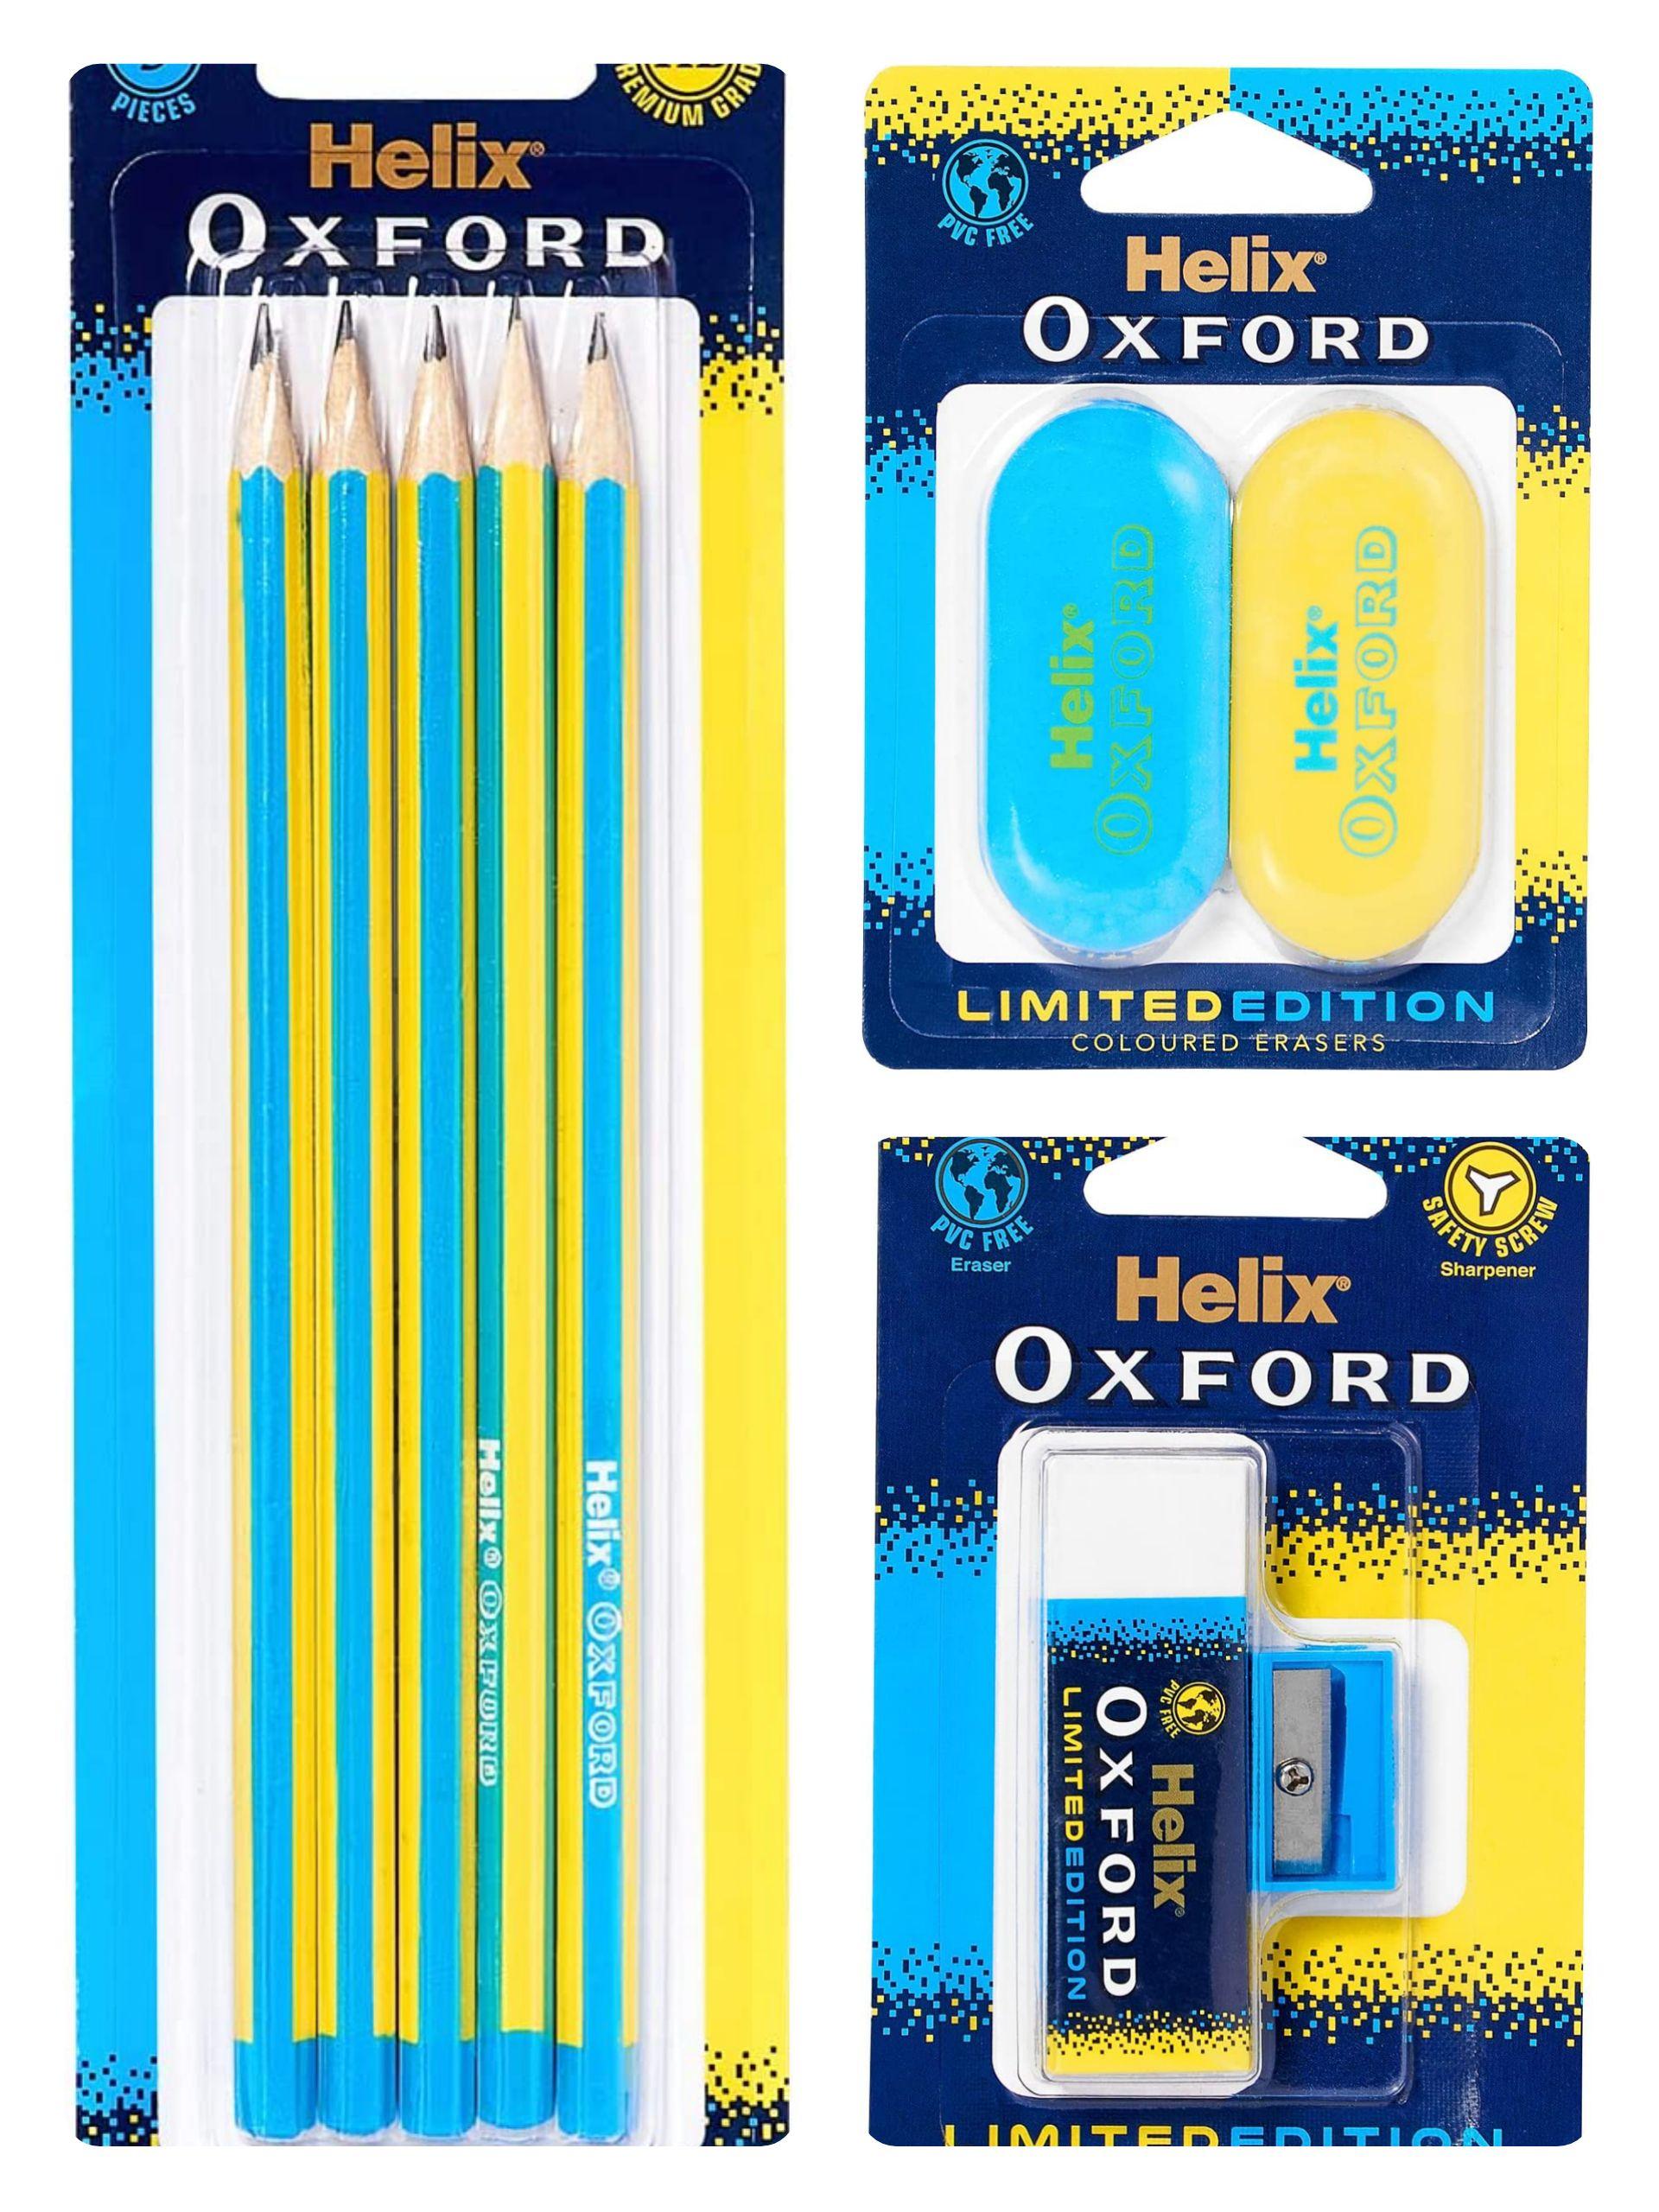 Helix Oxford Clash Twin Pack of Erasers - Blue 89p/ Eraser & sharpener 89p/pencils 92p (£4.49 p&p non prime) Amazon